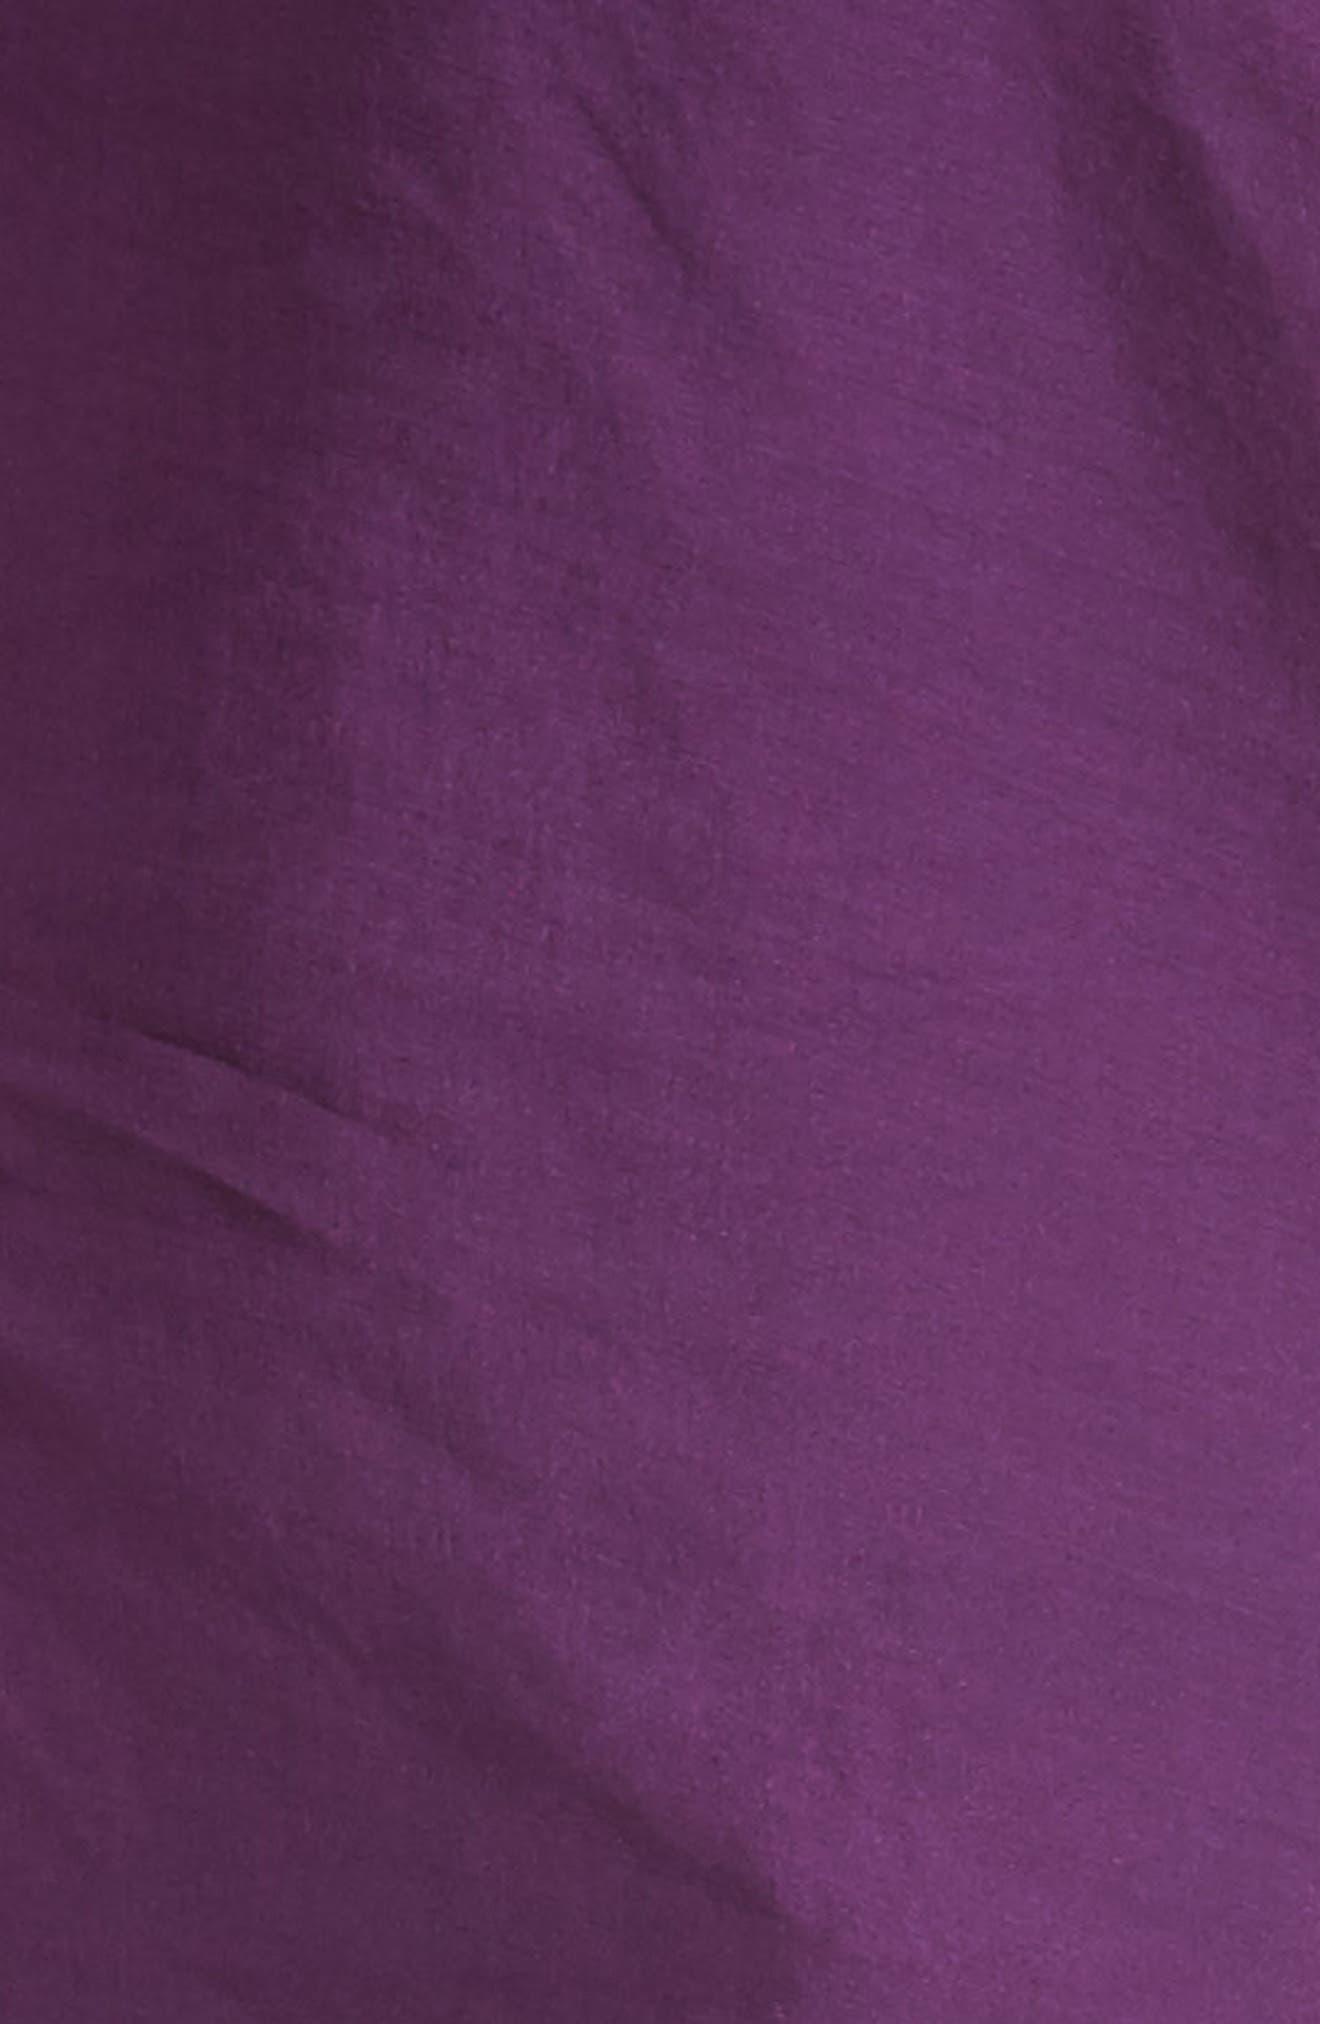 Satin Border Silk Wrap,                             Alternate thumbnail 45, color,